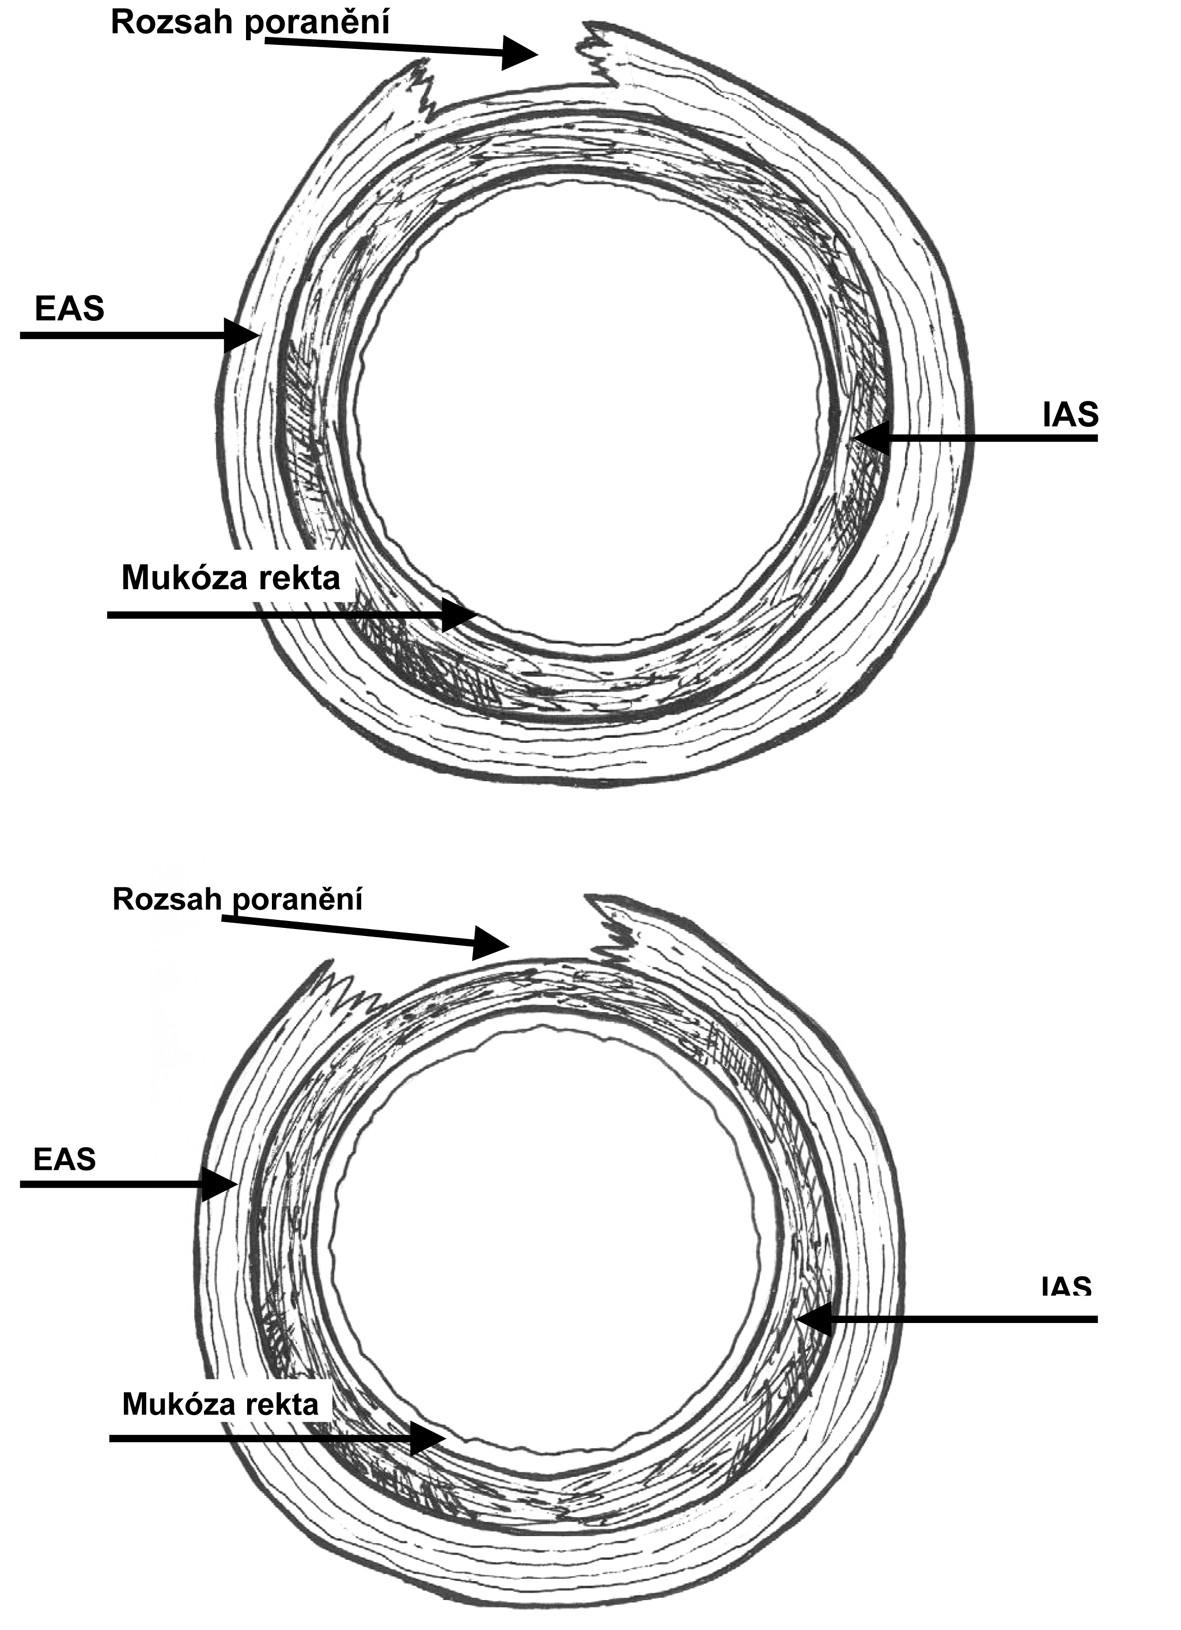 Obr. 2, 3. Ruptura perinea stupně 3b podle RCOG